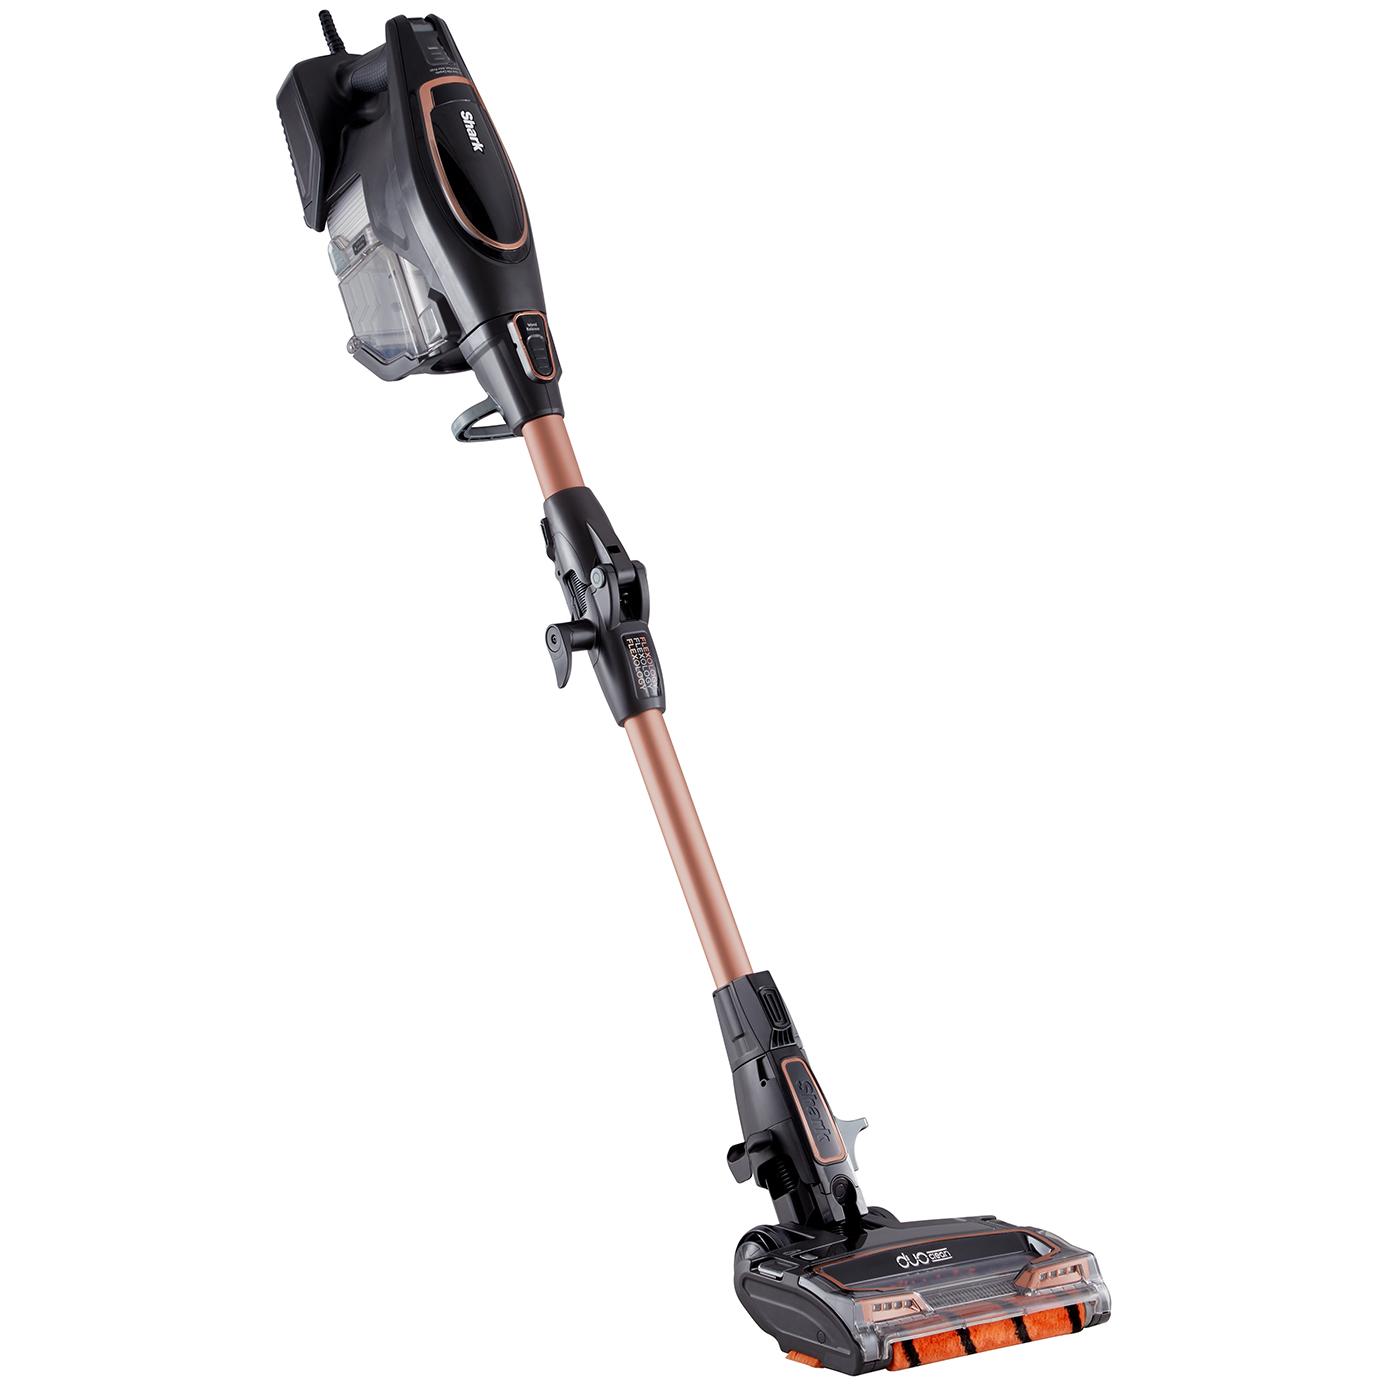 Shark Duoclean Corded Stick Vacuum With Flexology Truepet